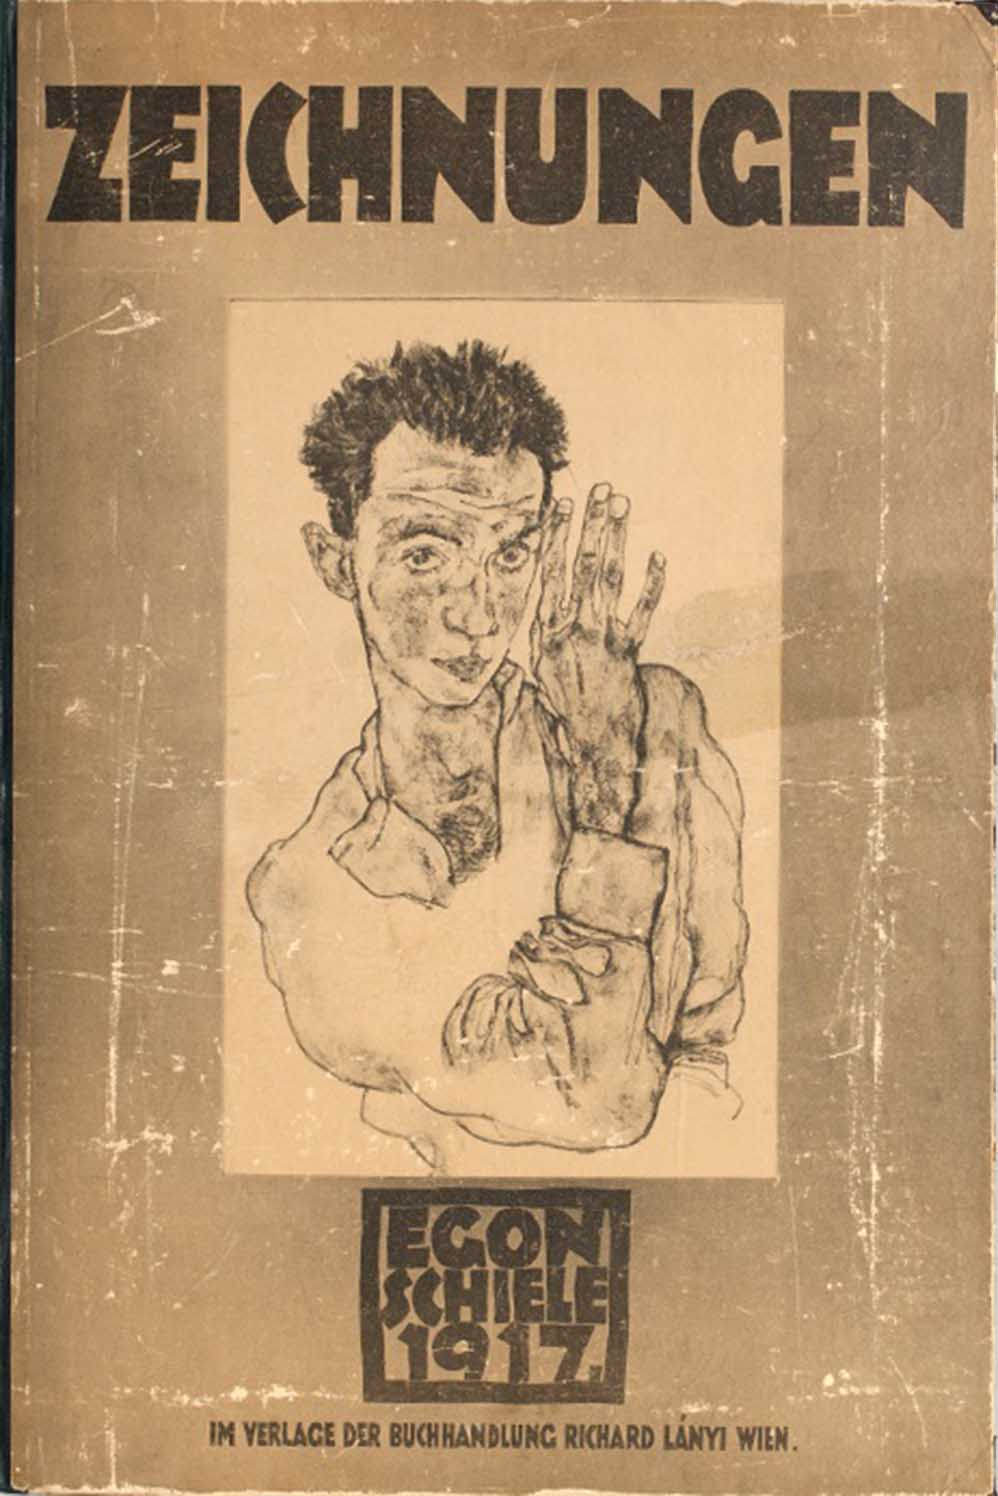 Egon Schiele -Cover ( autoportrait) From the portfolio Zeichnungen (drawings), incluing 12 Heliotypes, Ed° Librairie Richard Lanyi,Vienne, 1917.